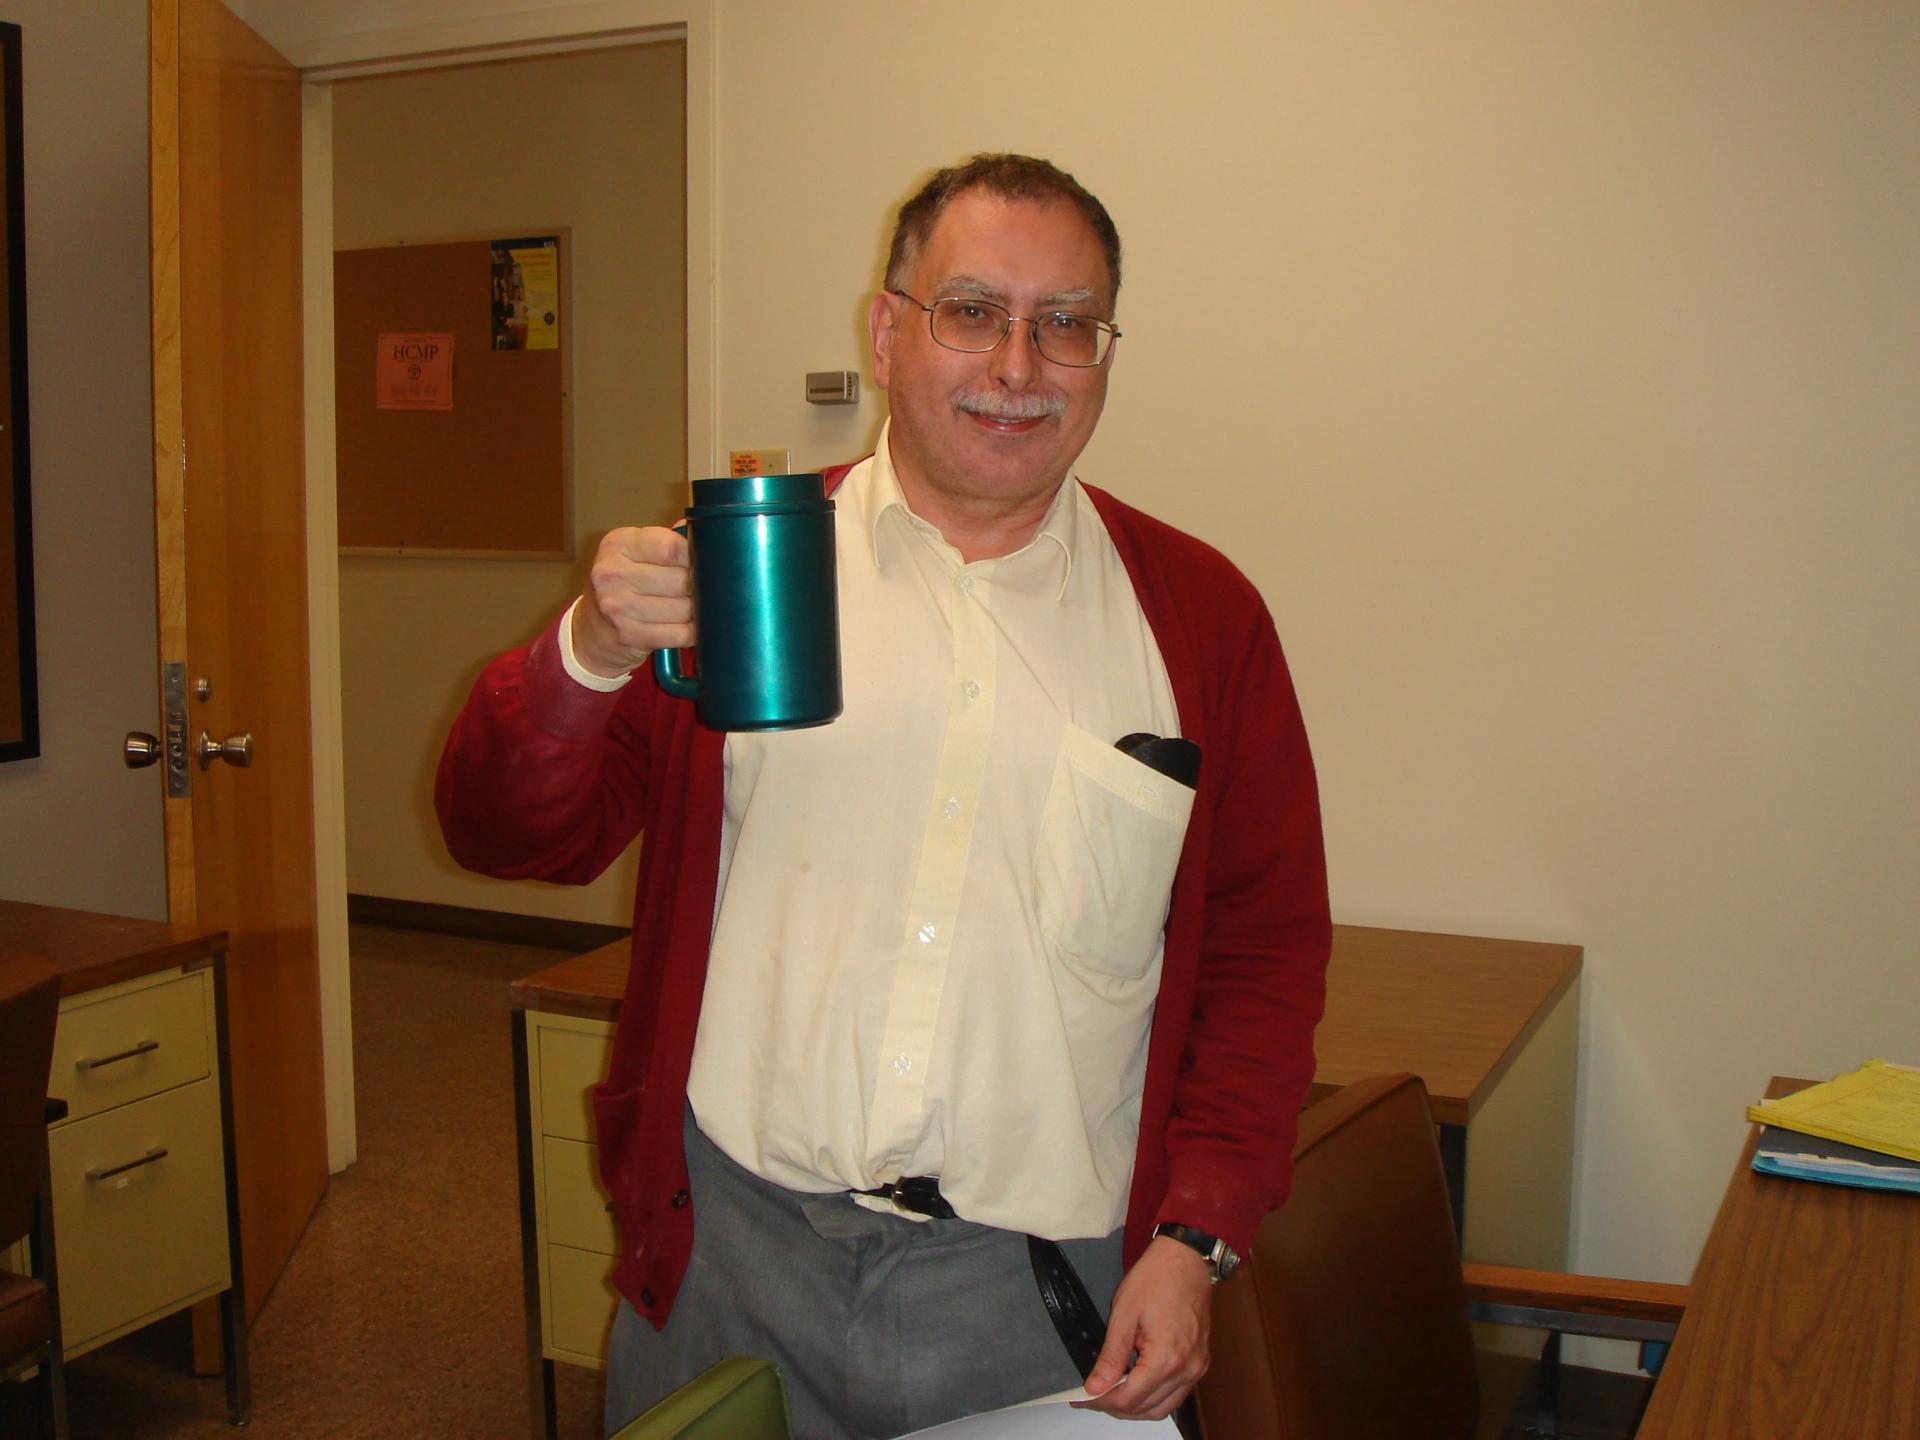 Professor Rafael de la Llave from Georgia Tech